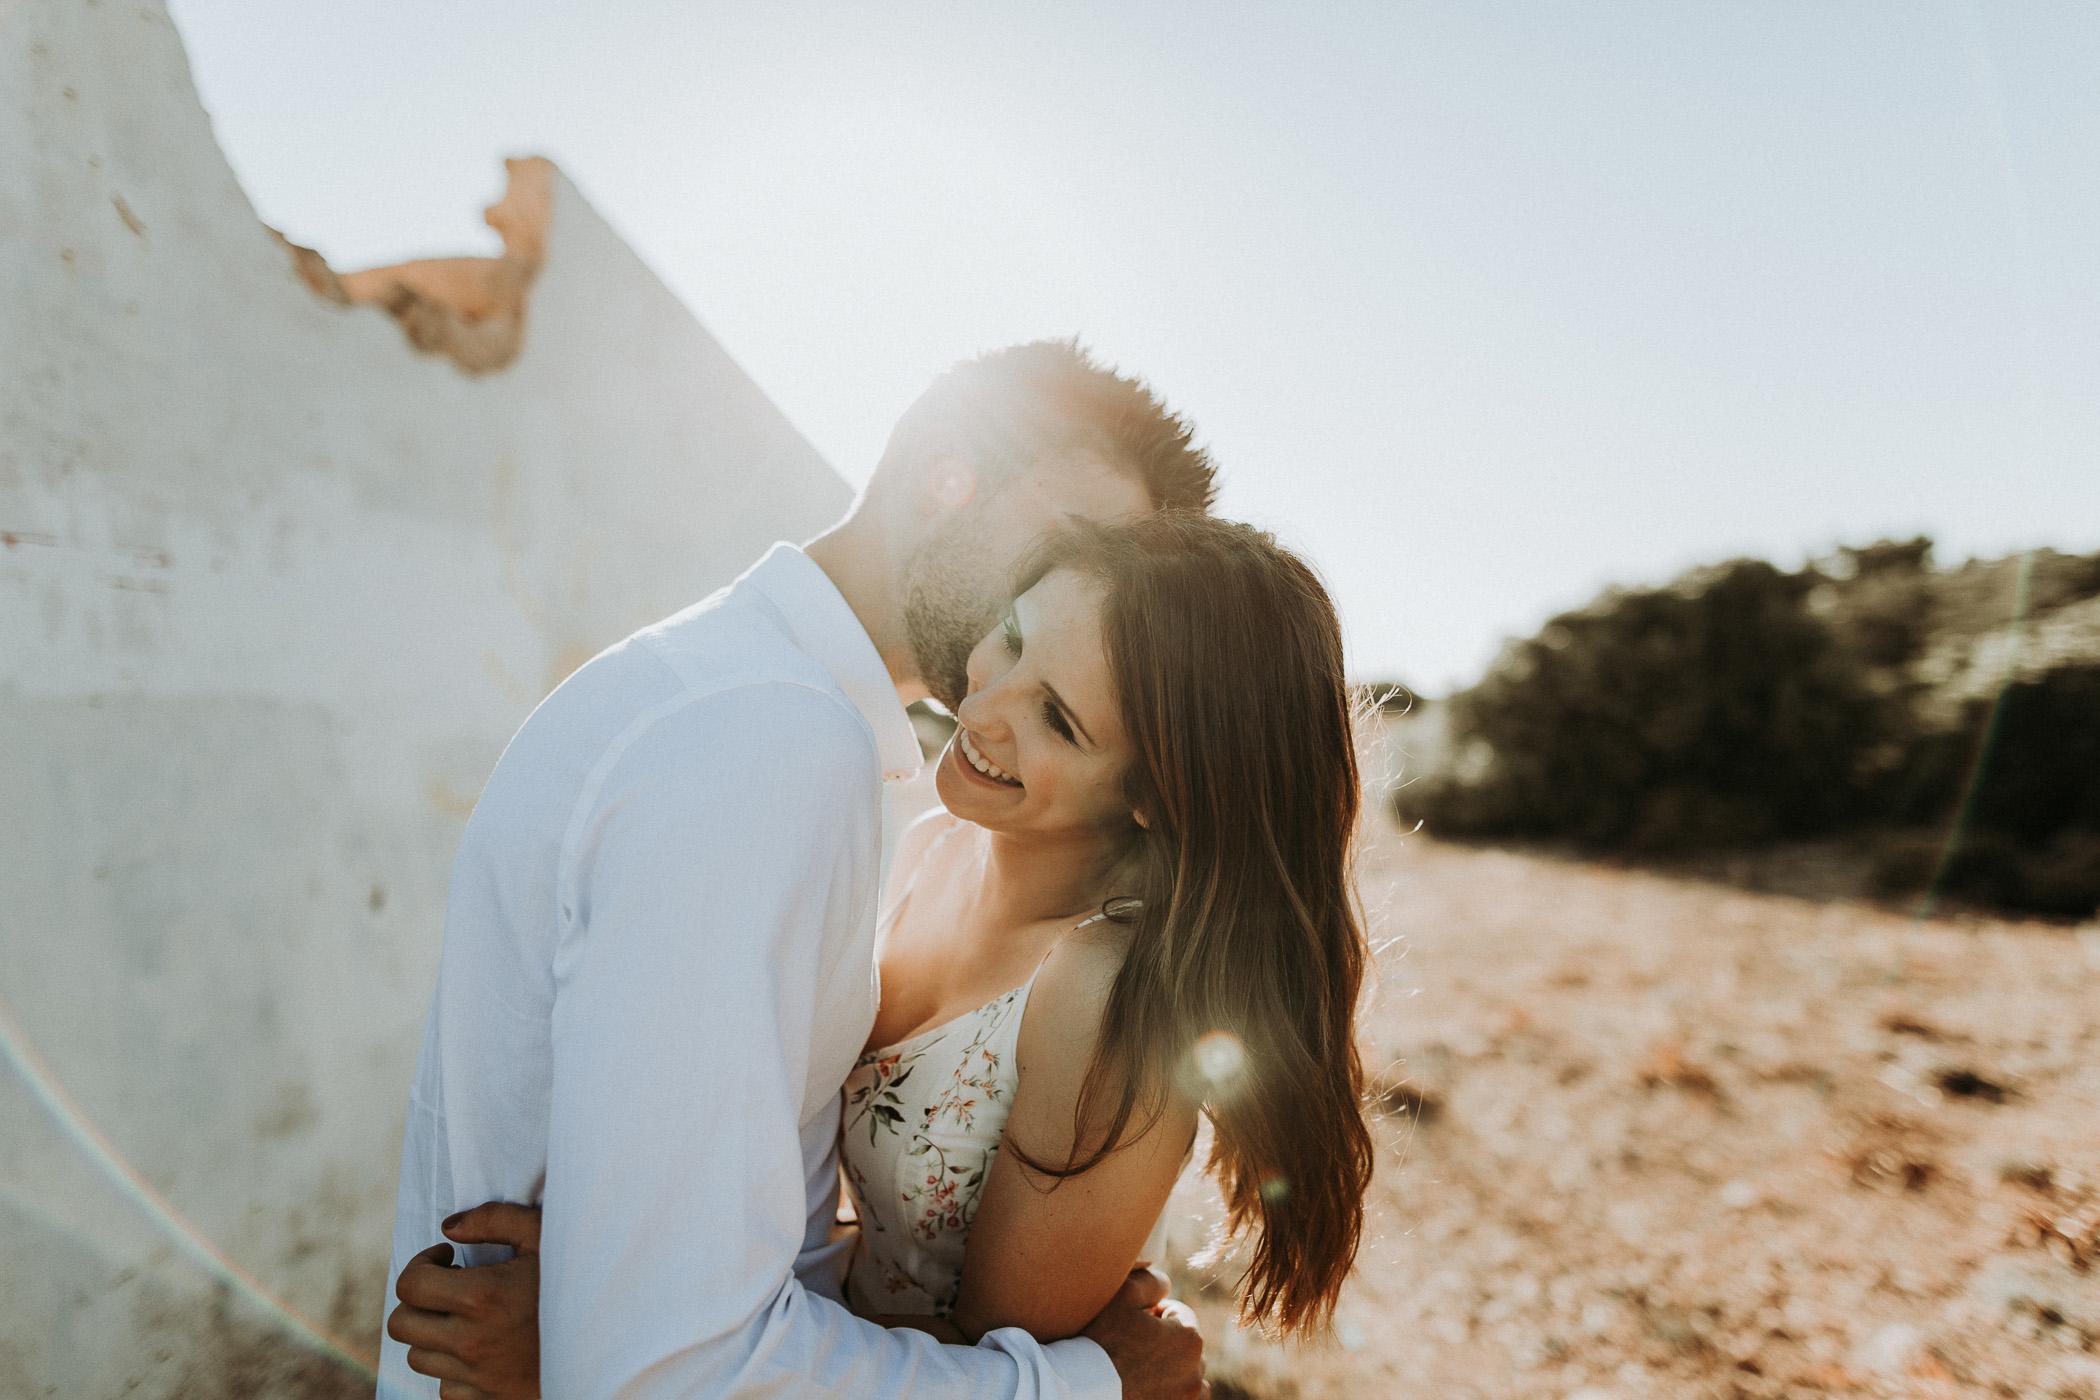 DanielaMarquardtPhotography_wedding_elopement_mallorca_spain_calapi_palma_lauraandtoni_366